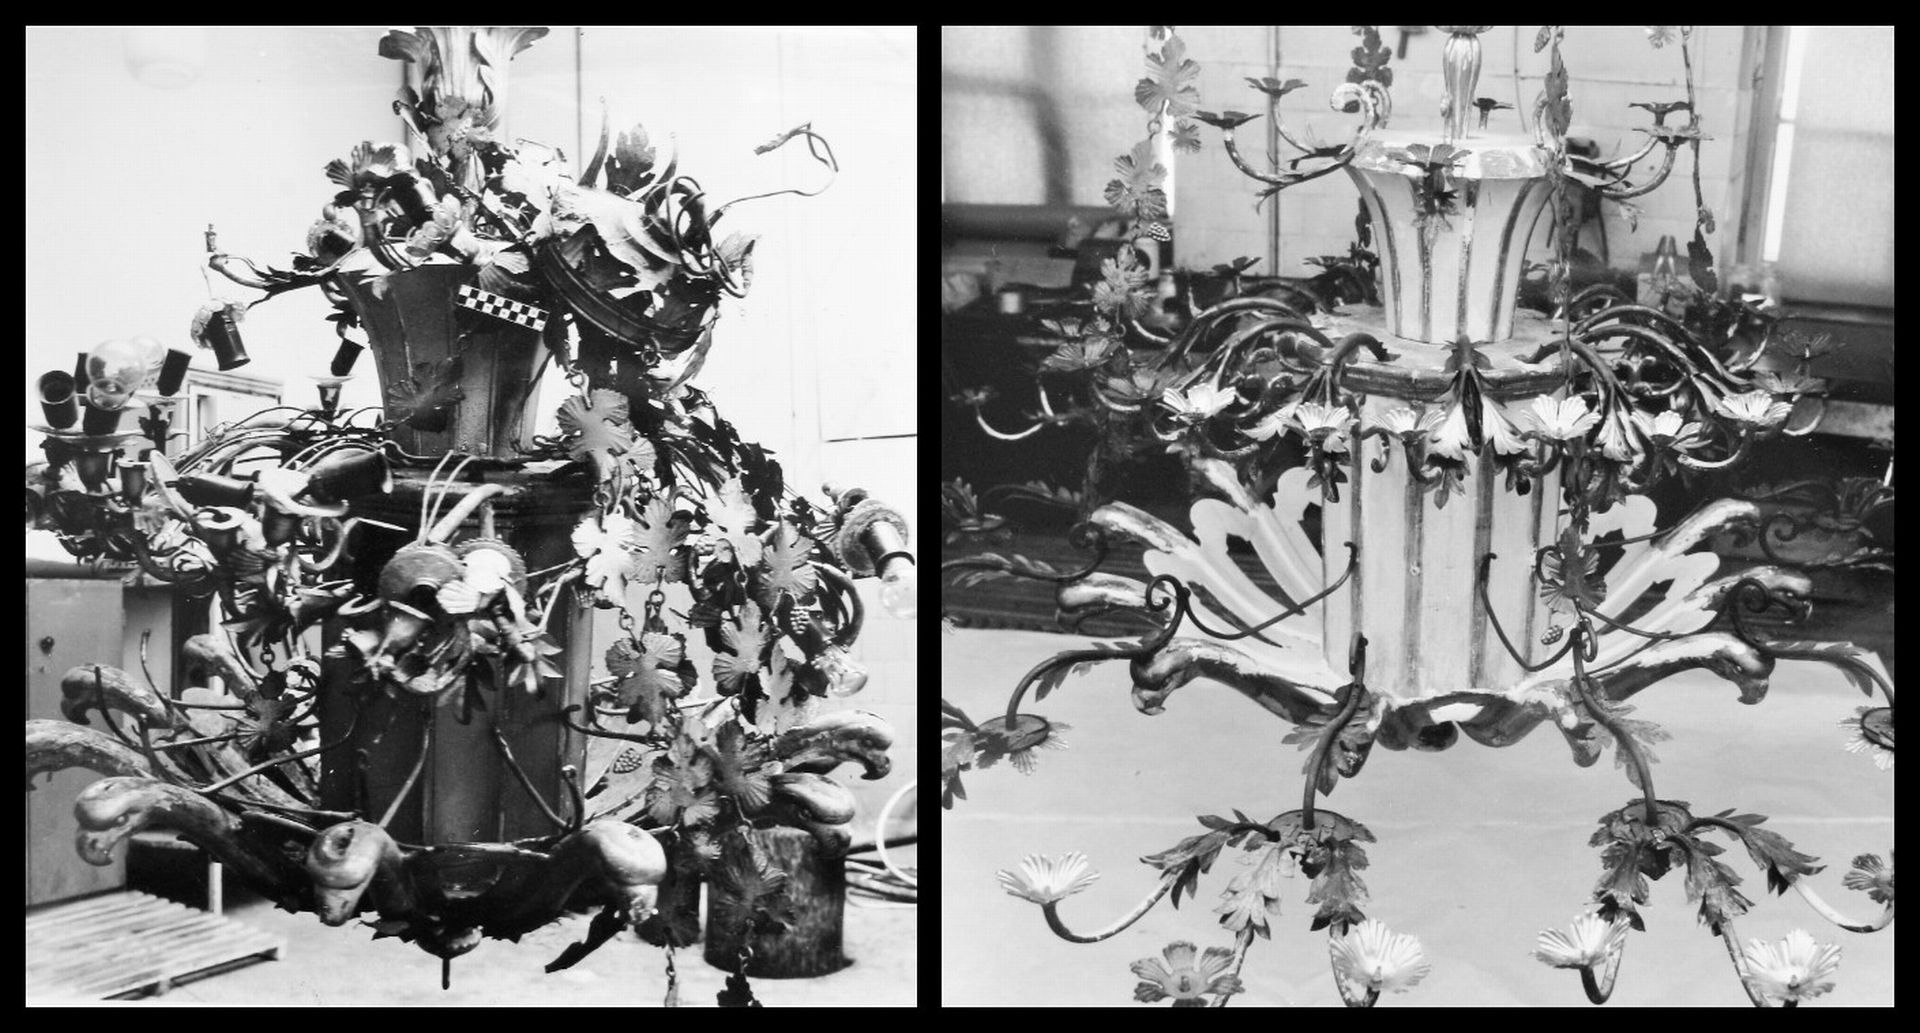 Chandelier before and after restoration, 1985–1988, in: Lietuvos dailės muziejaus Prano Gudyno restauravimo centras, f. 1, ap. 1, b. 255